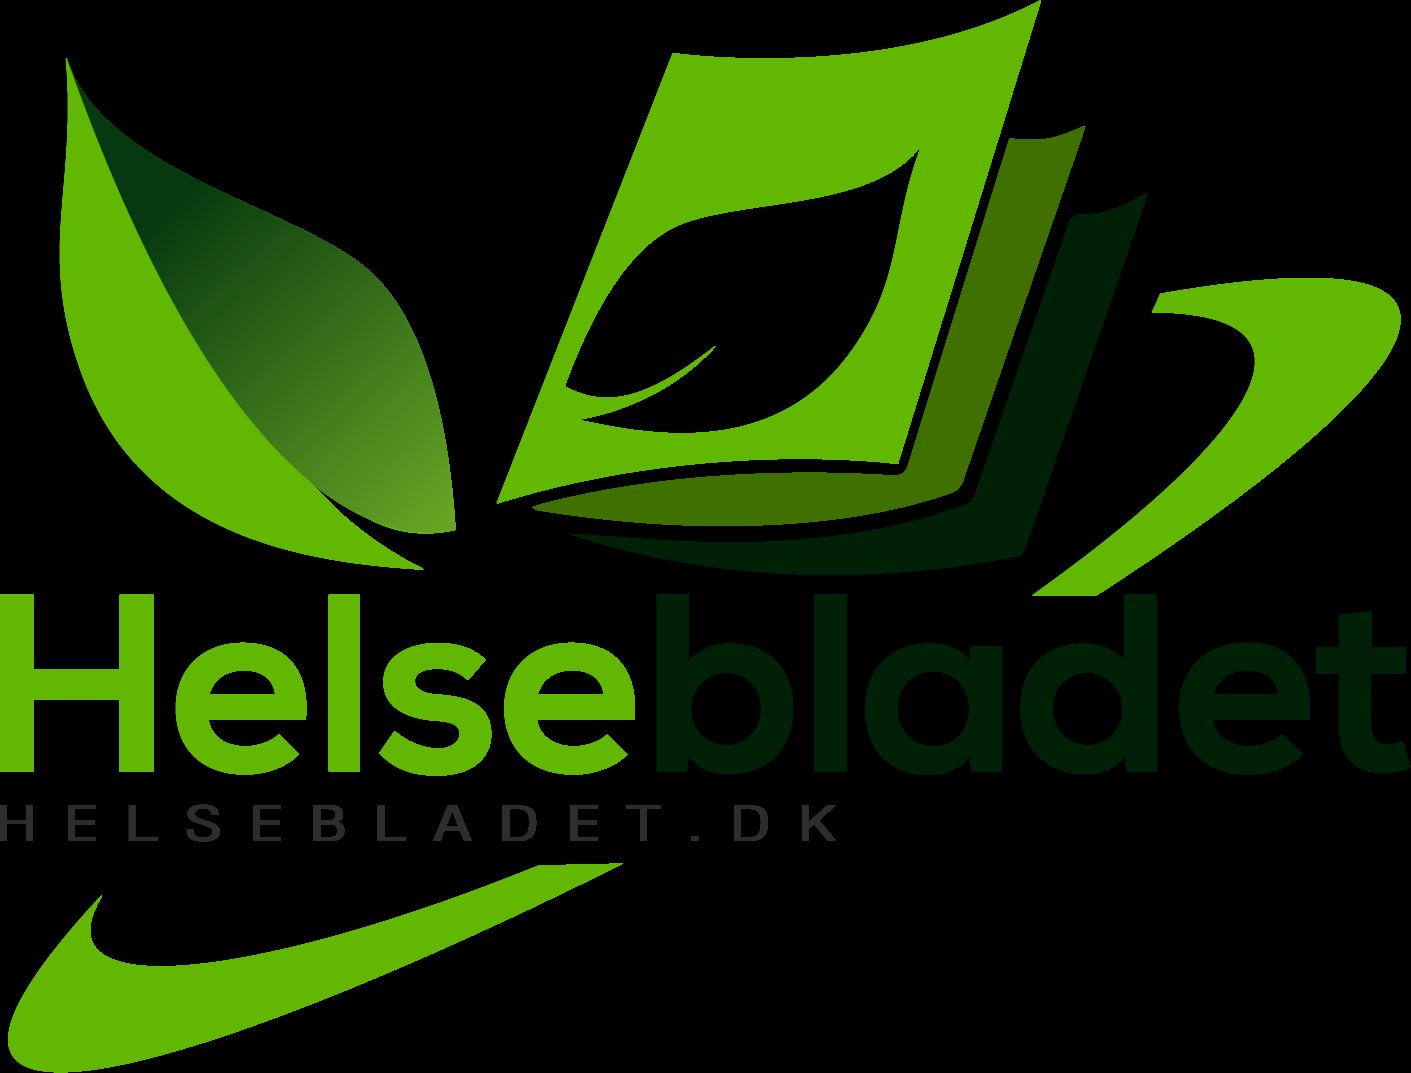 Helsebladet.dk